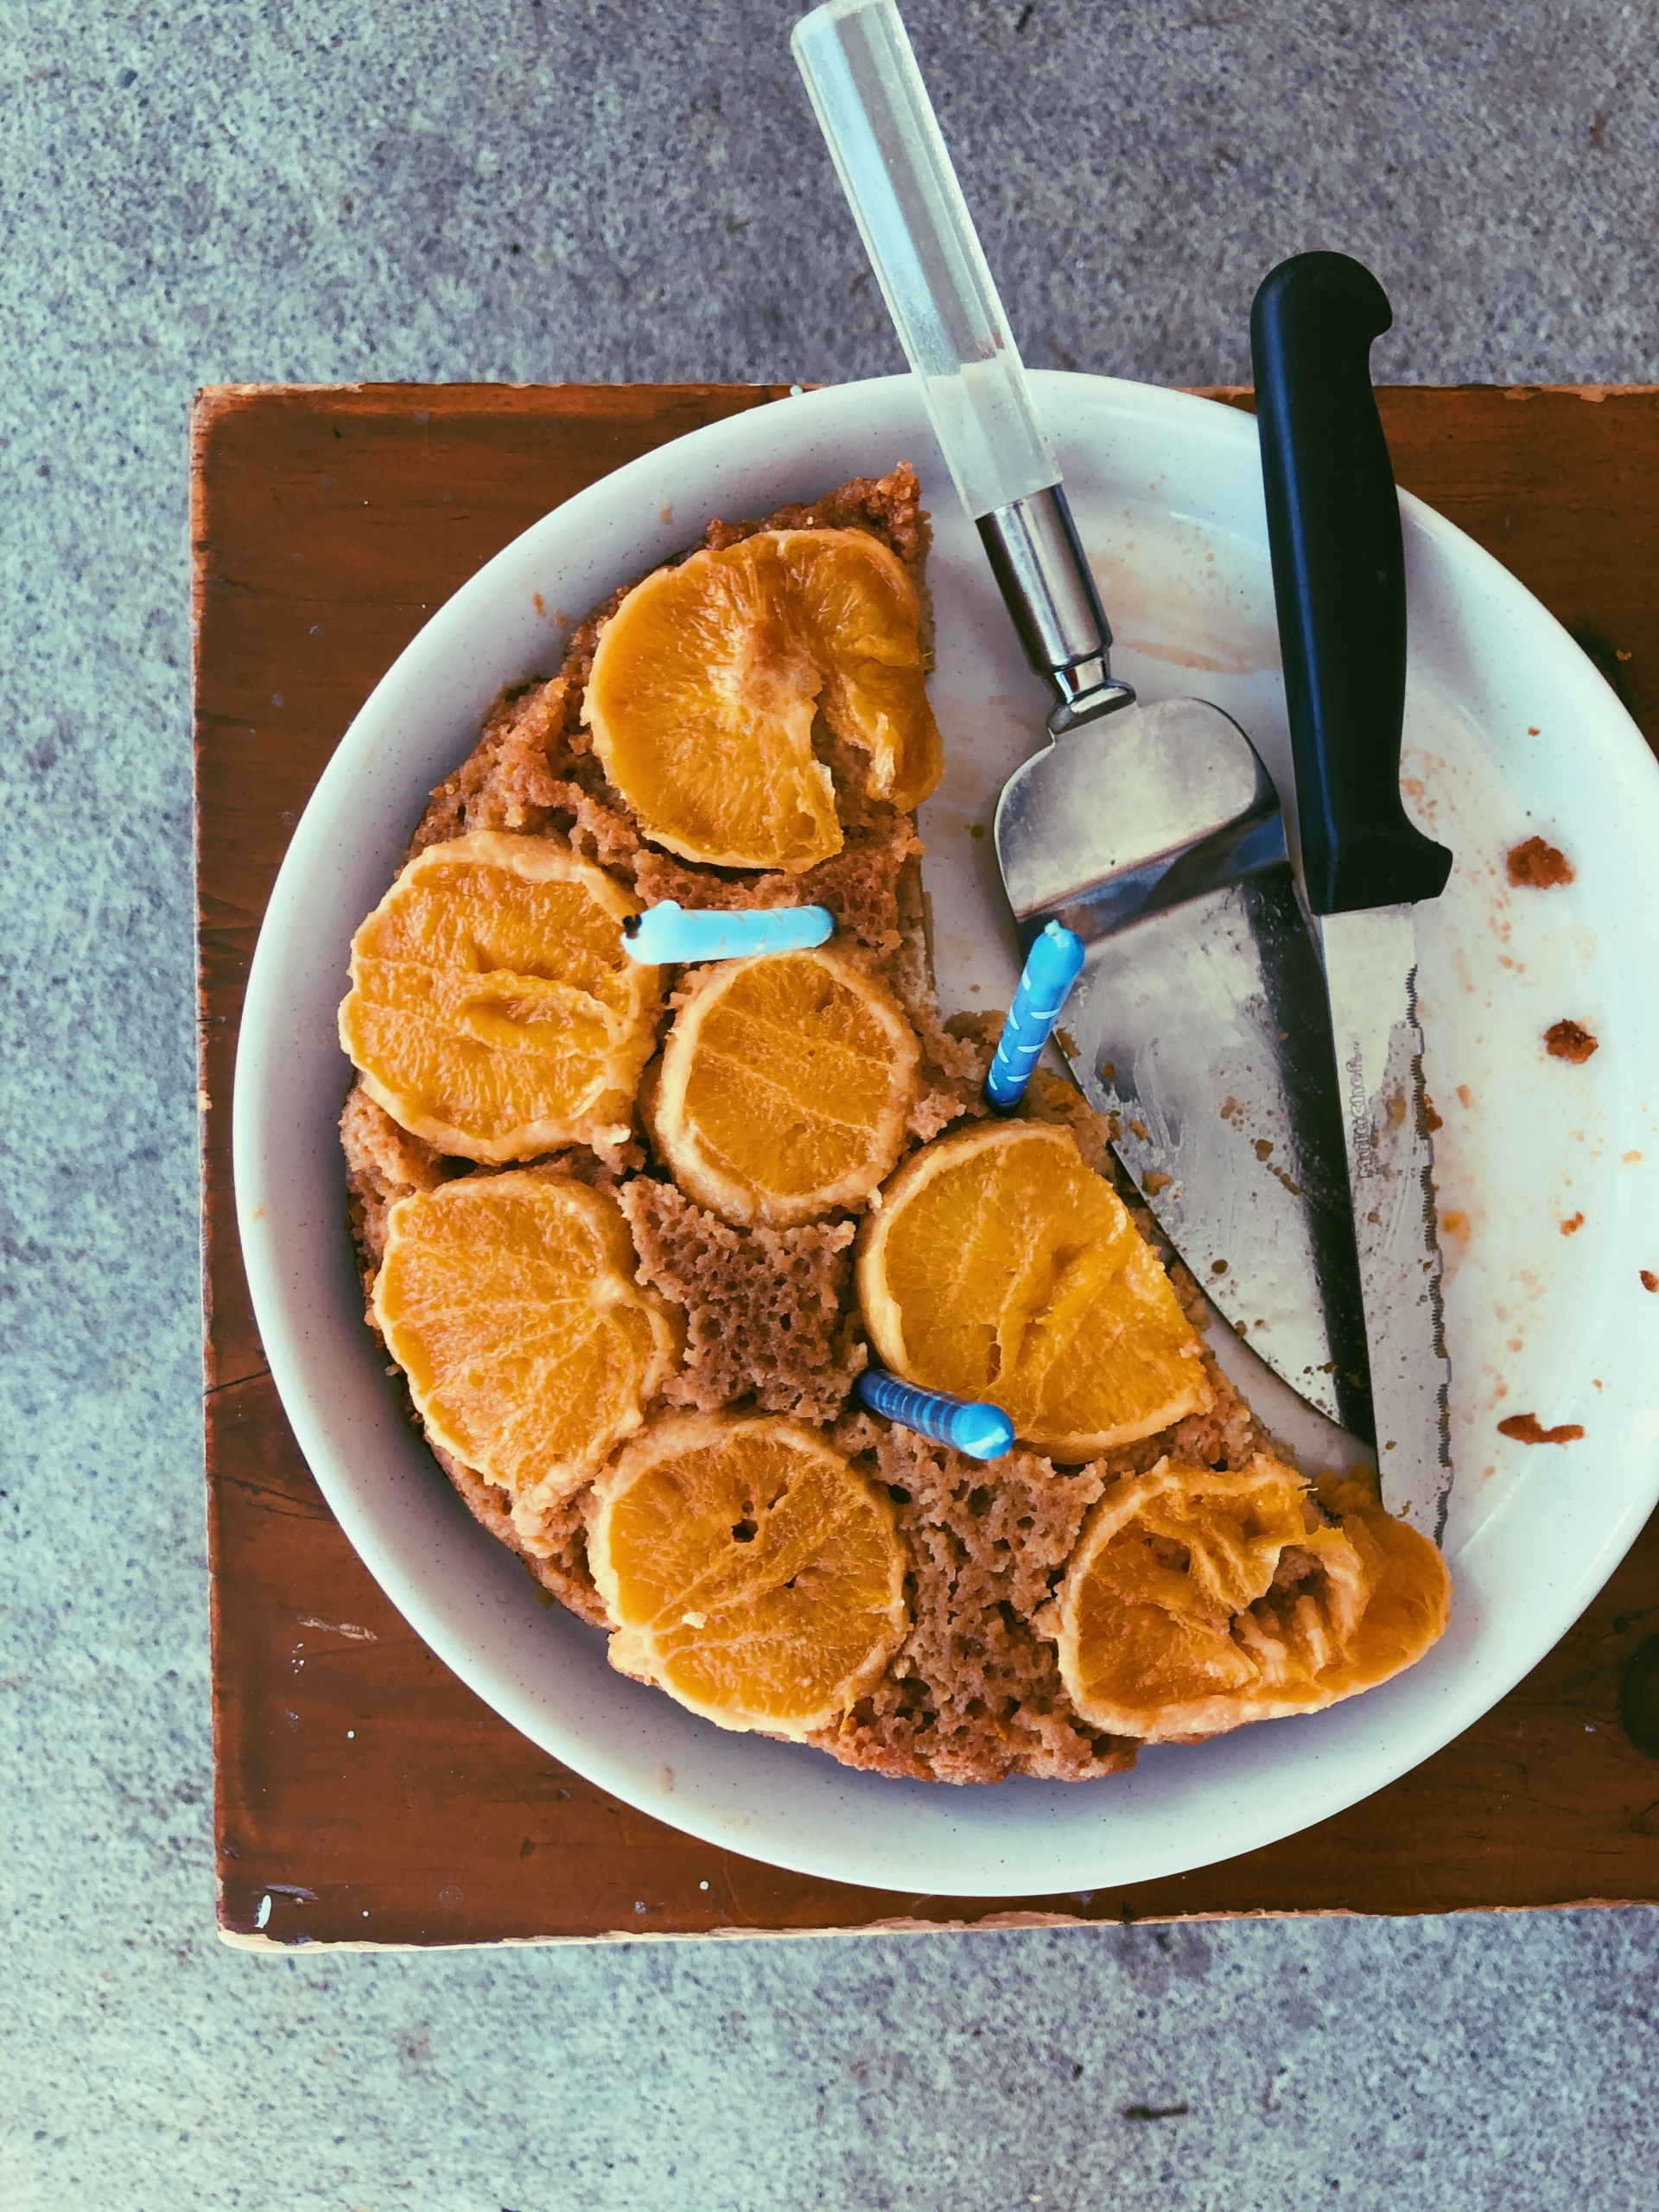 orange upside down cake with coconut flour, grain free, scd diet